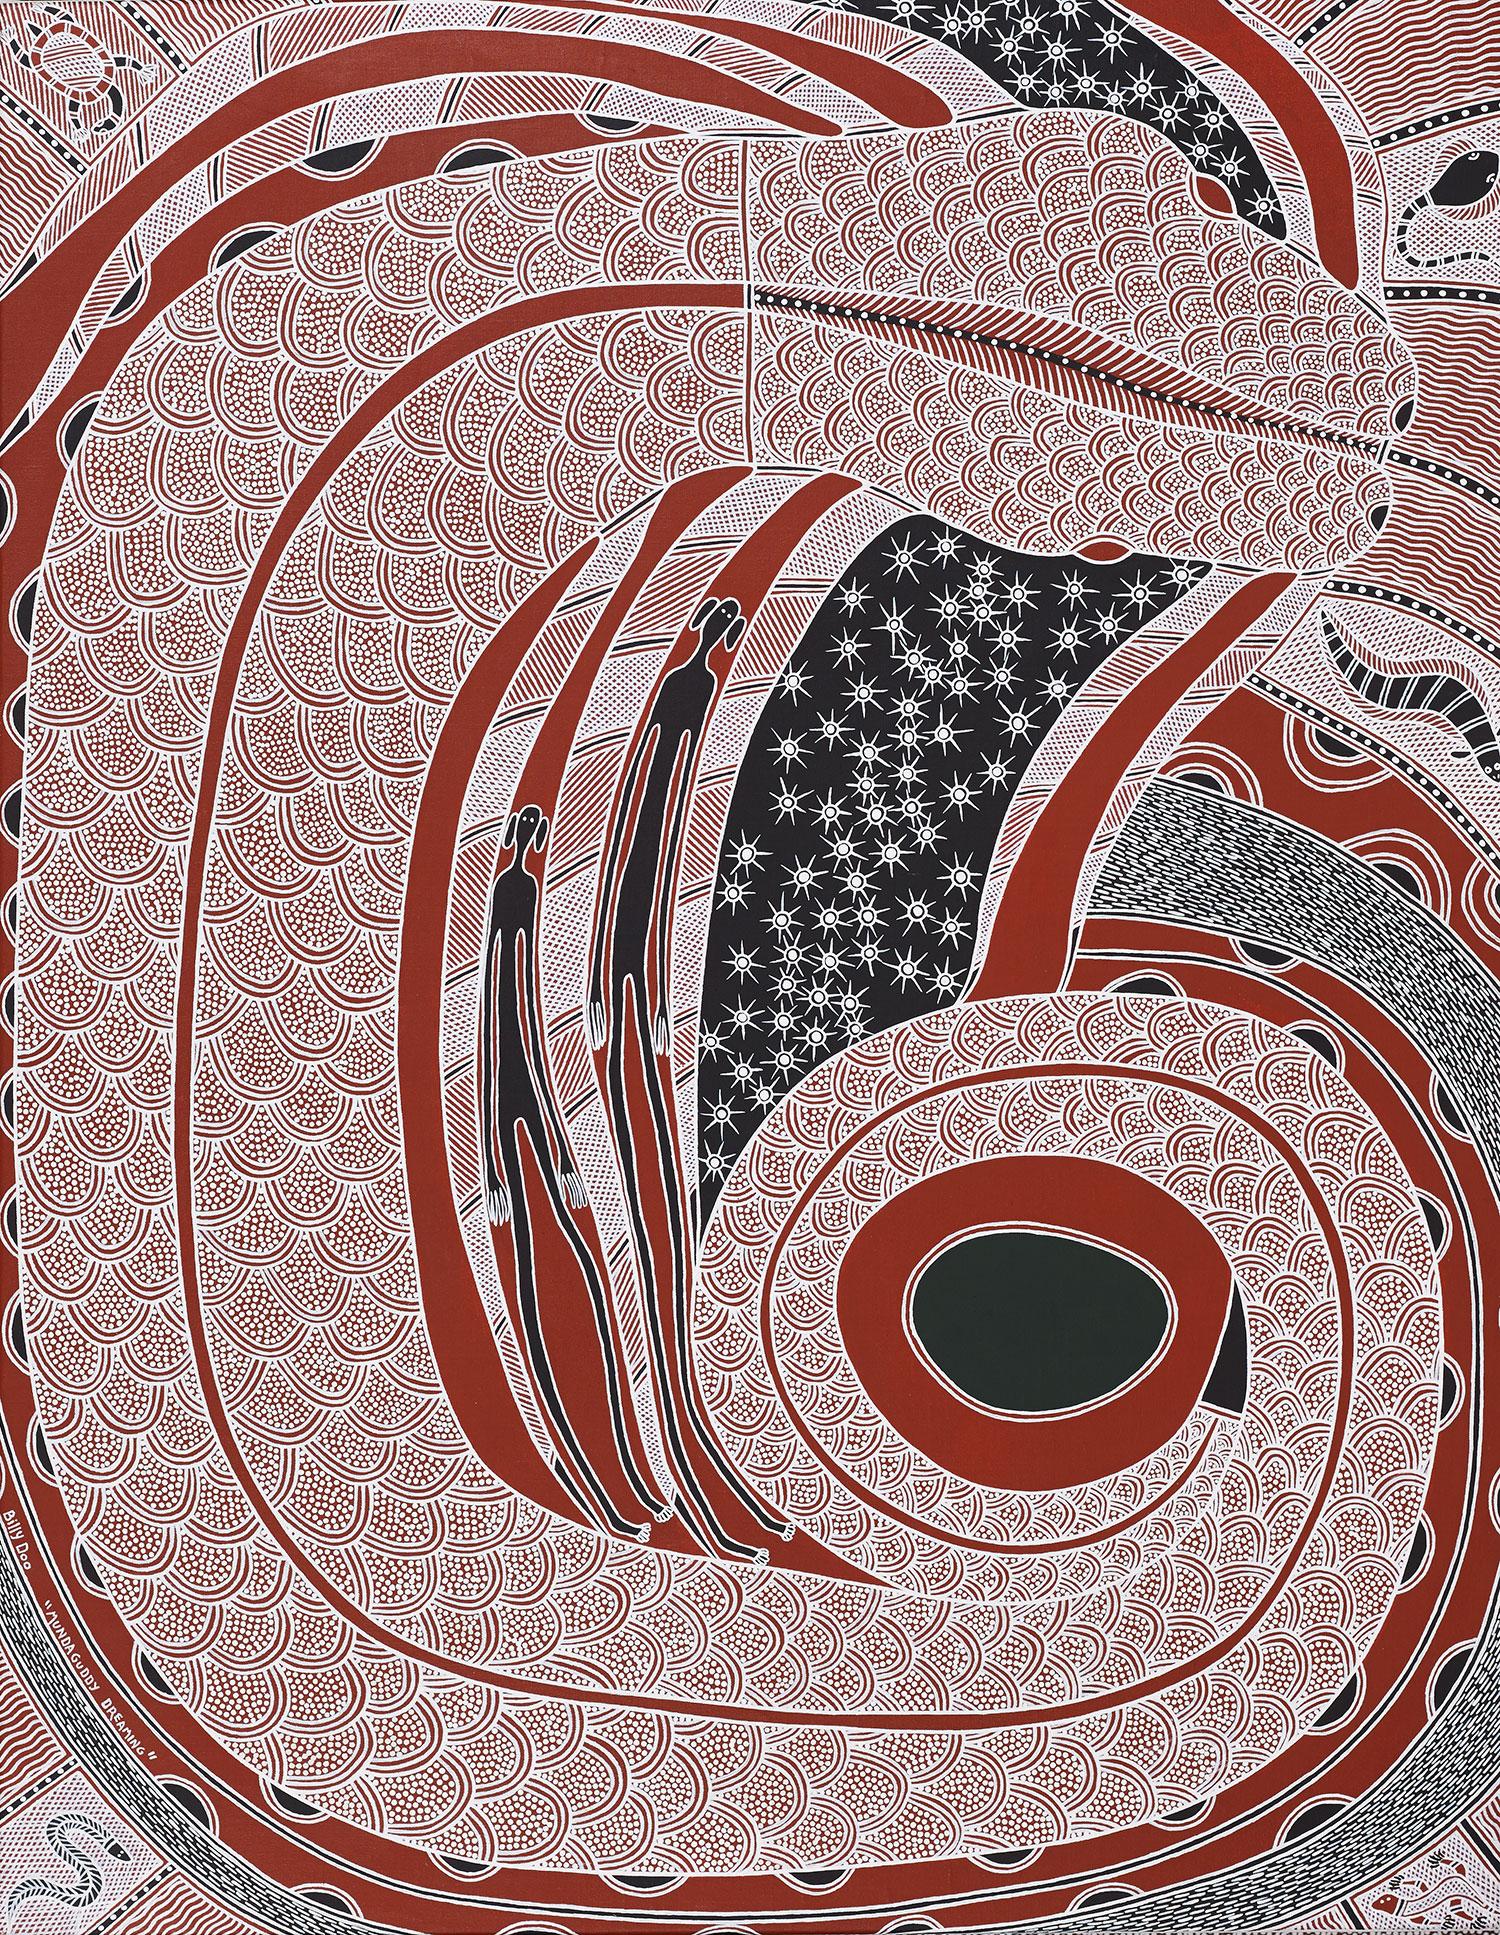 Artist/Environmentalist Billy Doolan's Patterns of Life